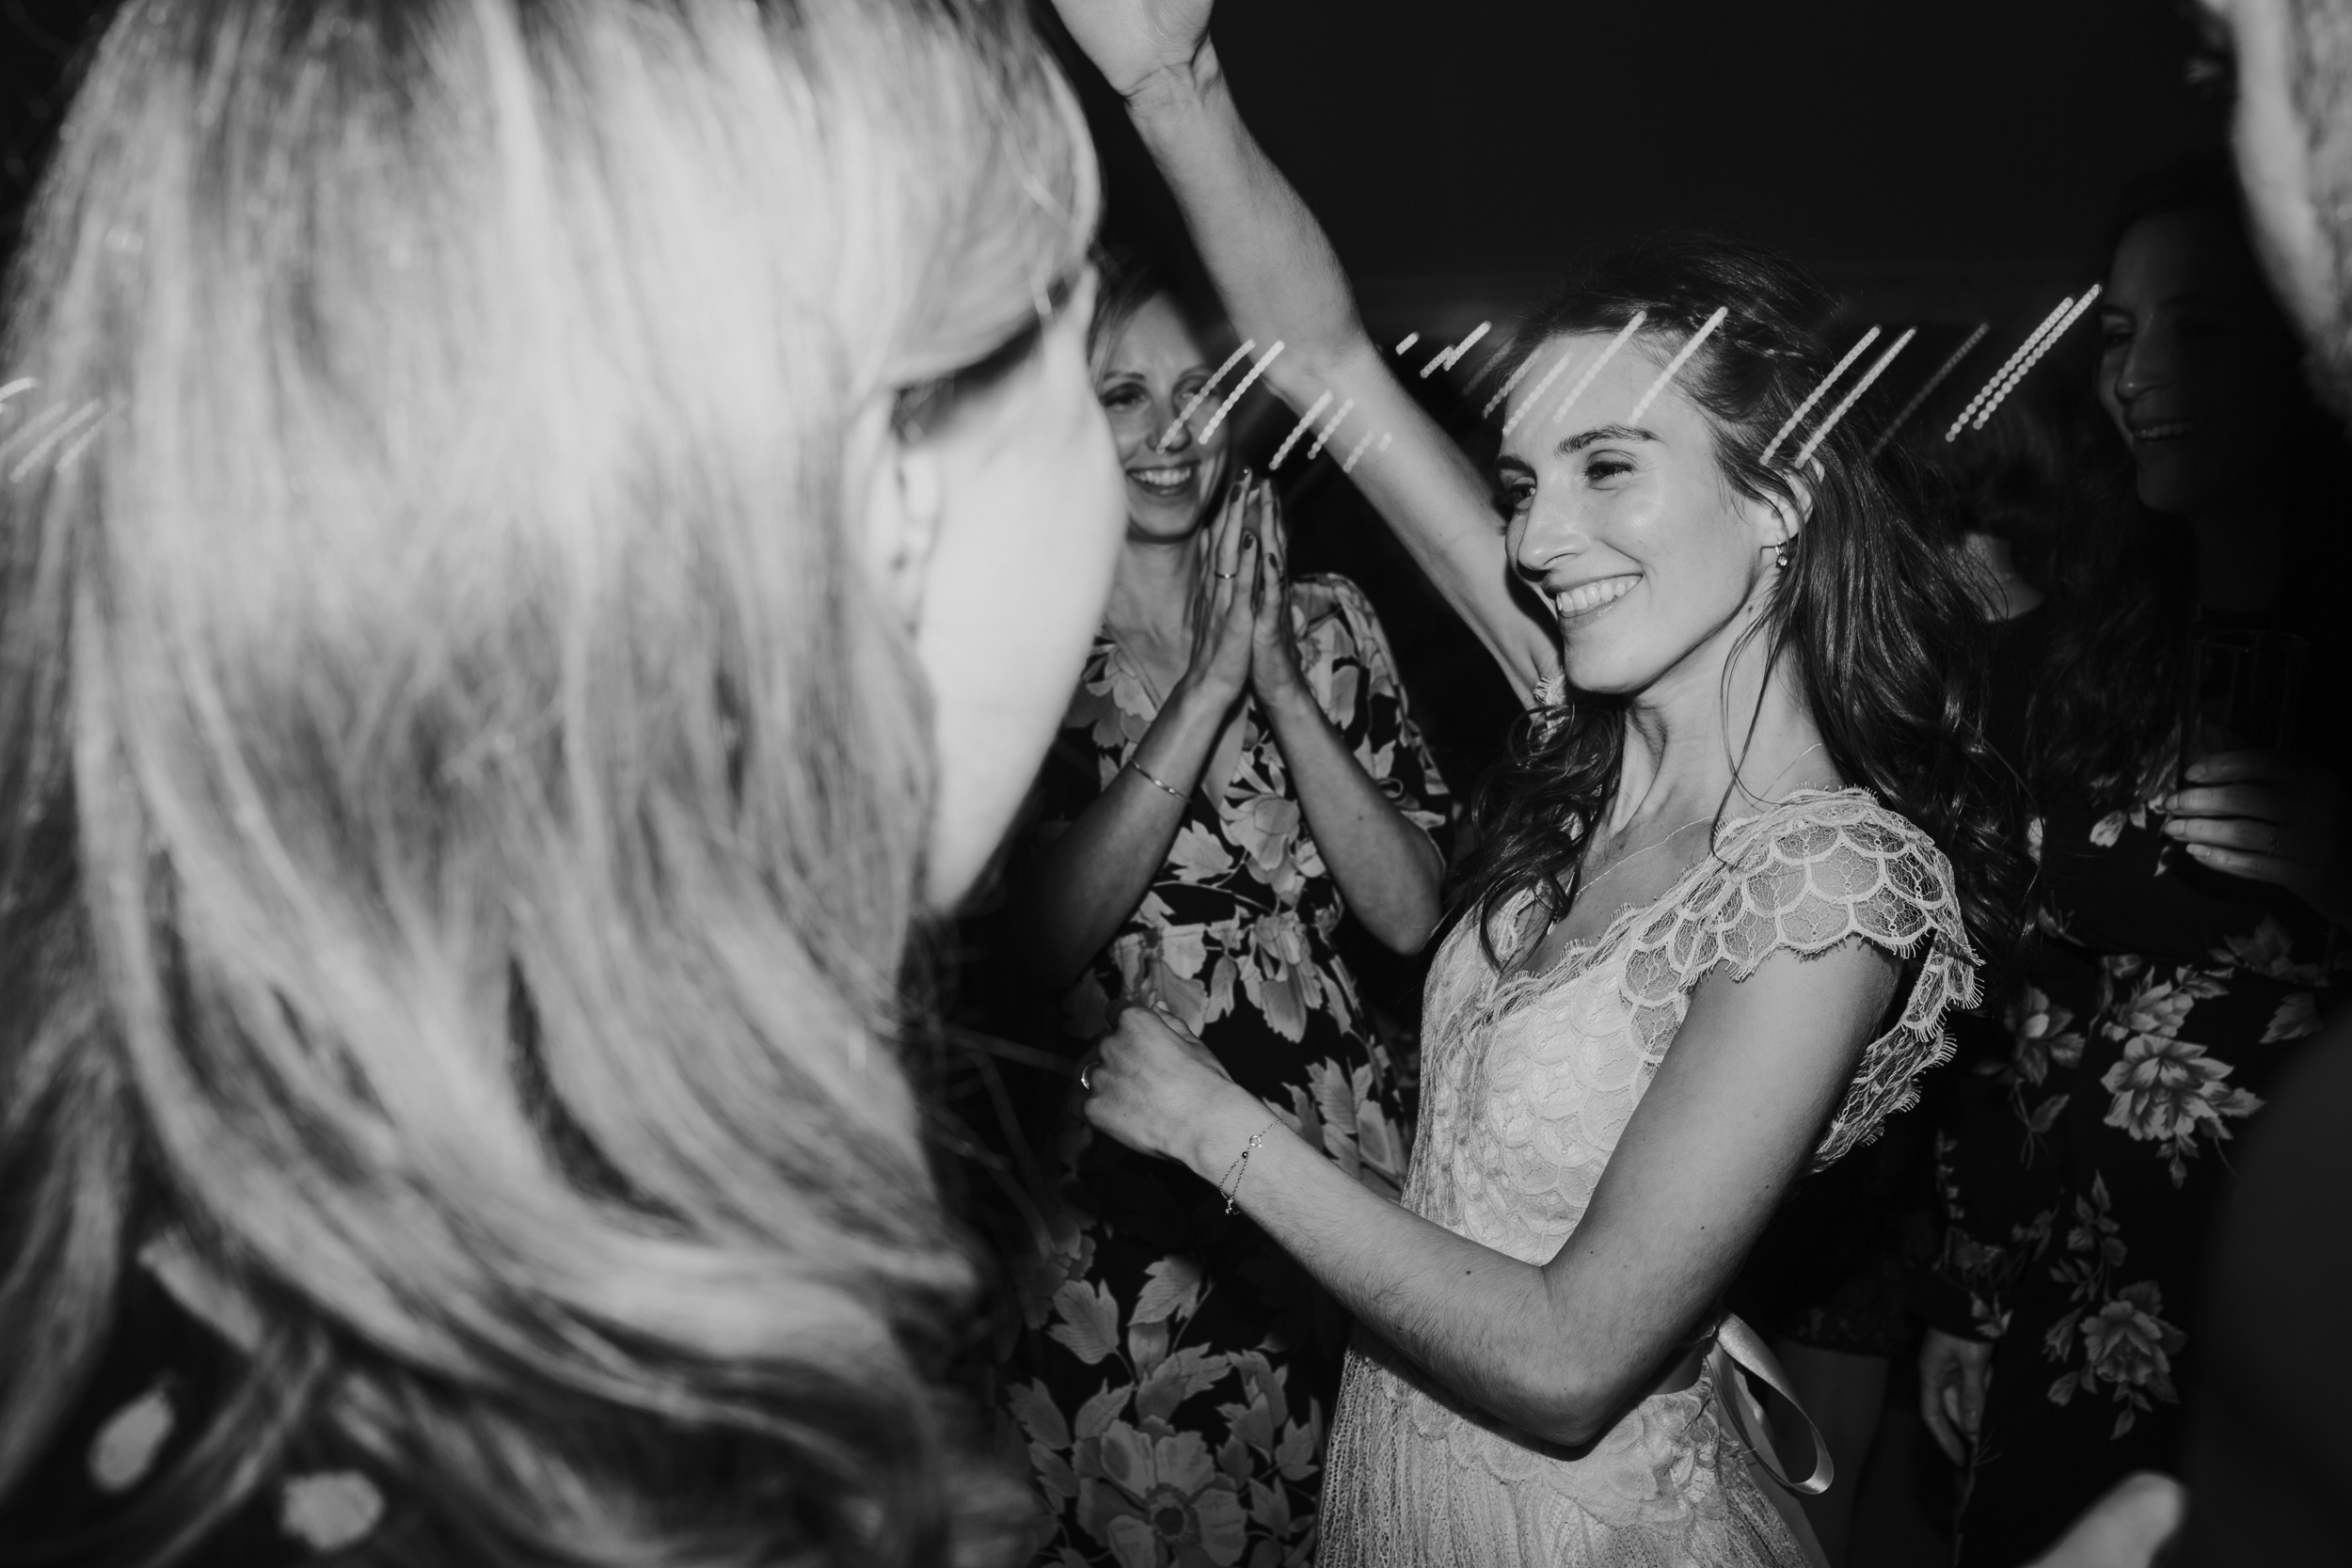 Joasia-Kate-Beaumont-Bohemian-Lace-Wedding-Dress-Peak-District-Sheffield-Wedding-60.jpg